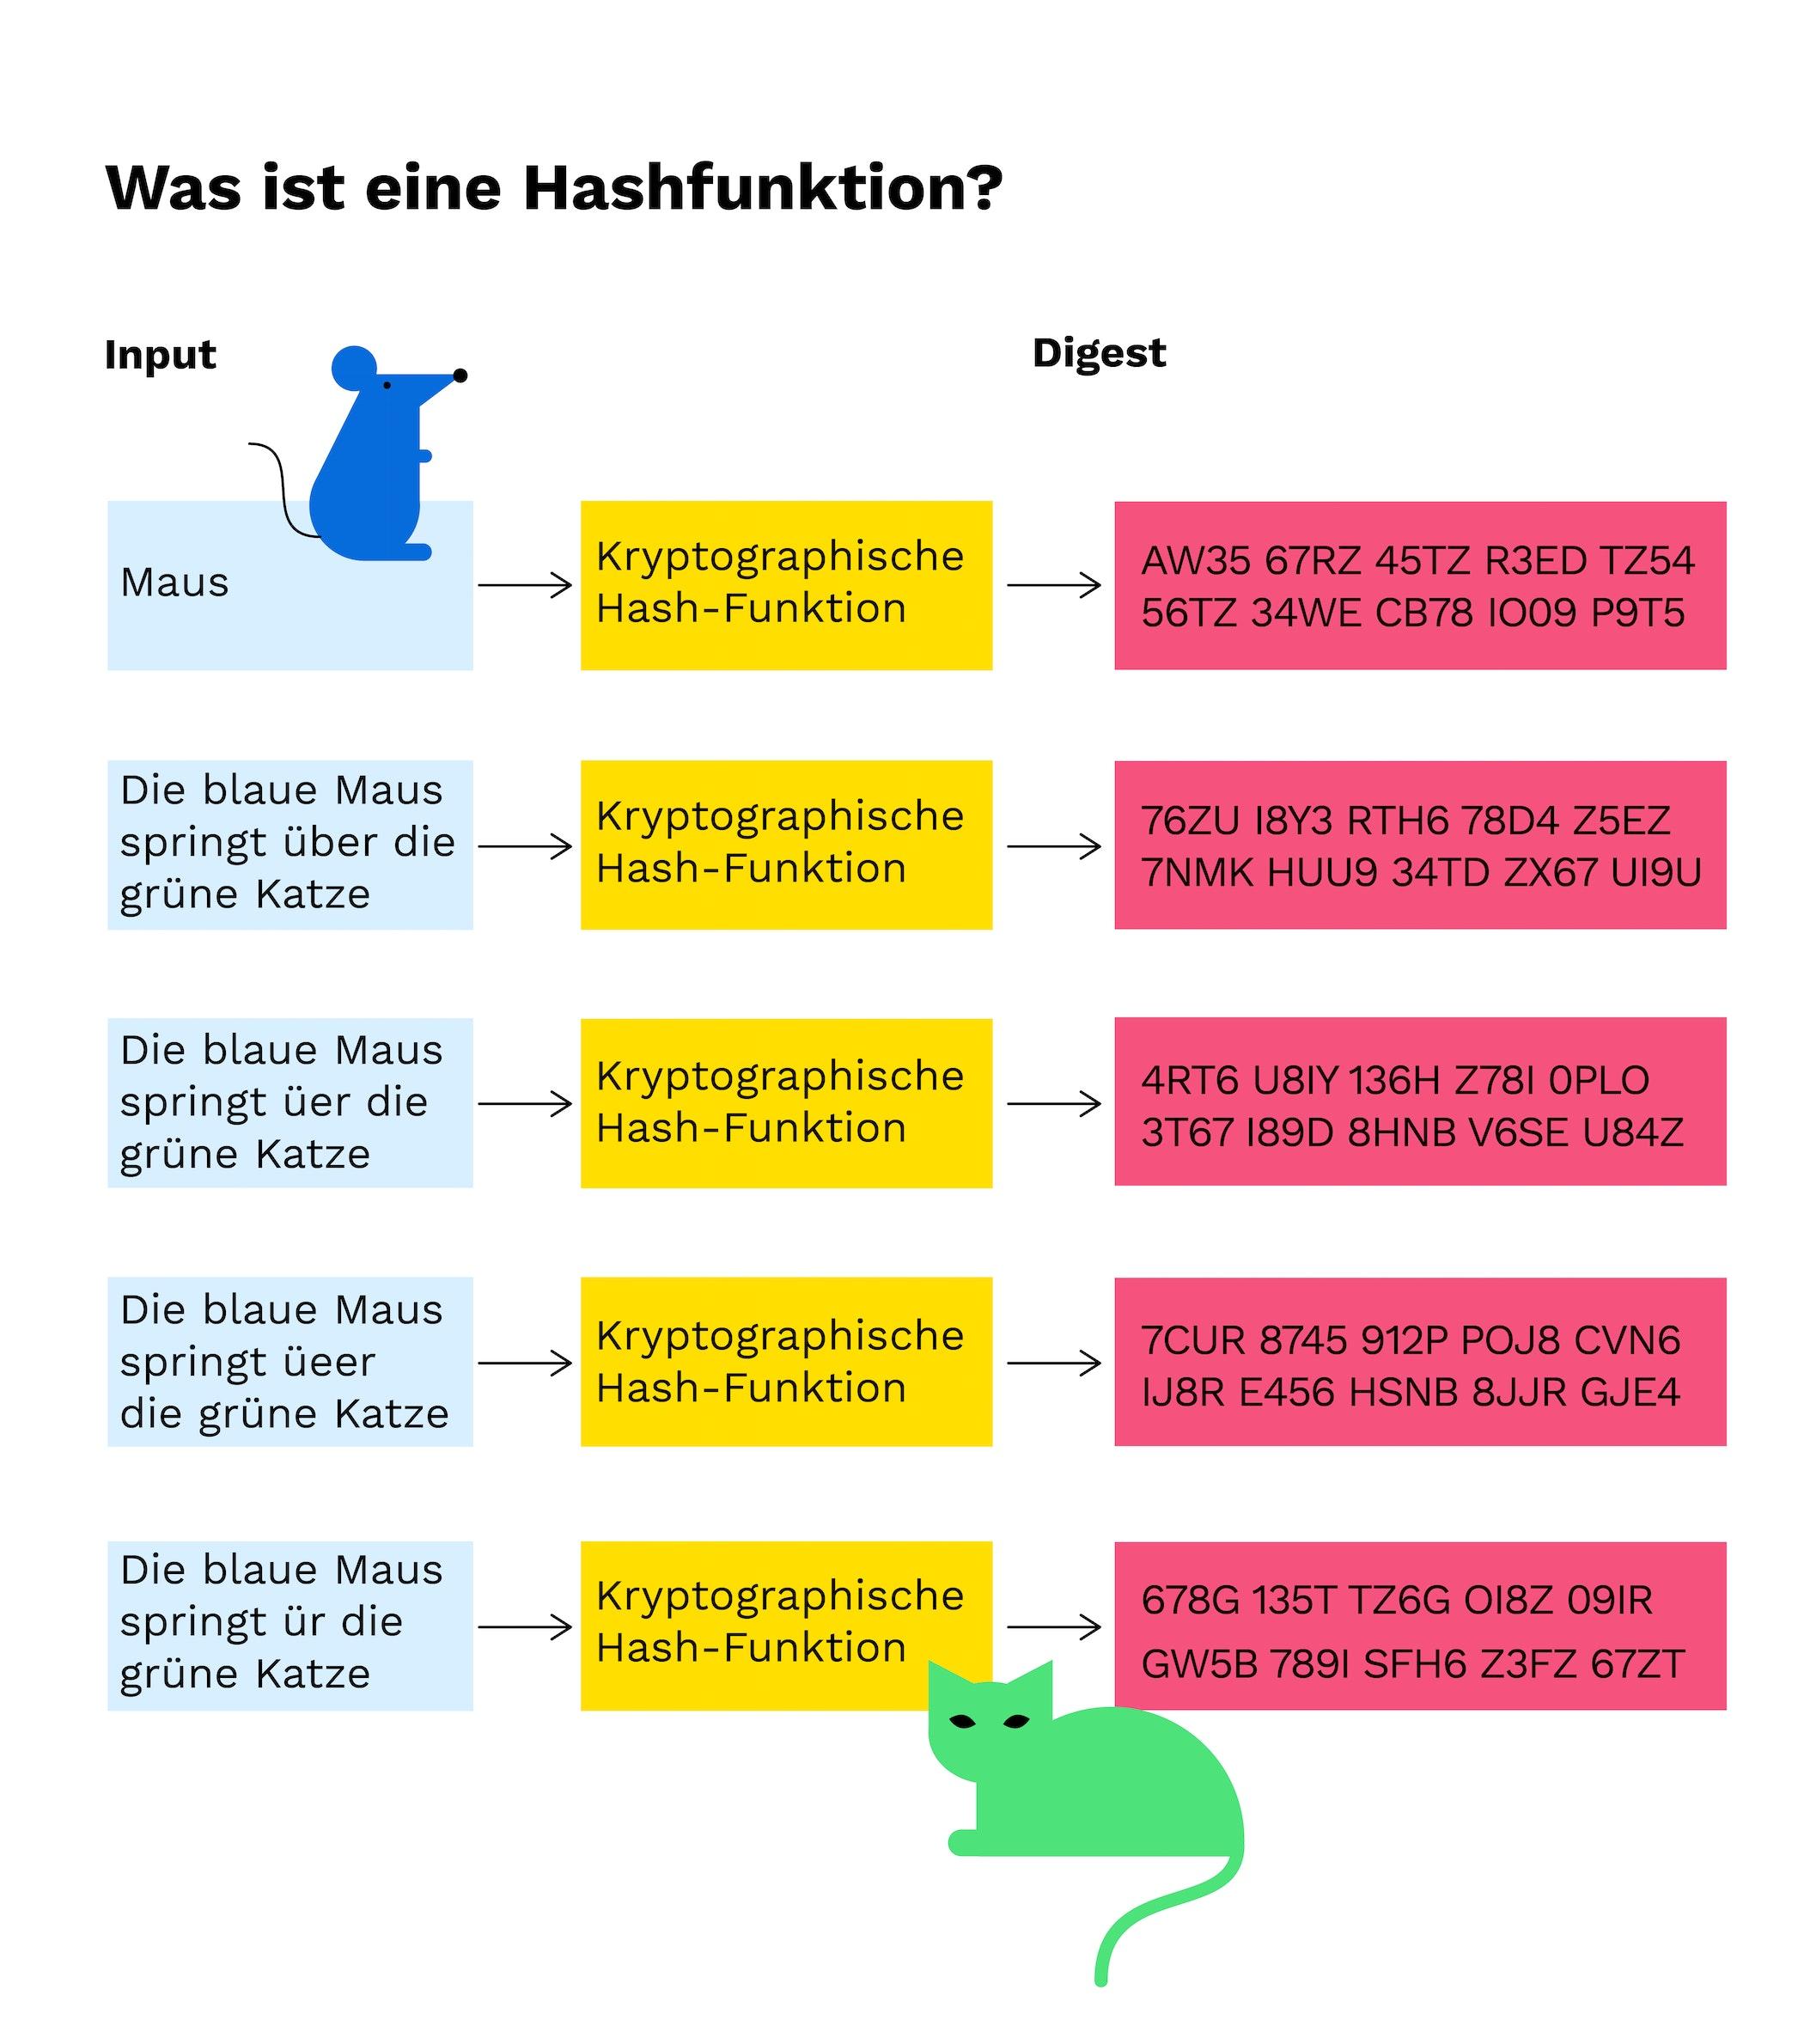 BTC Hash-Funktion.